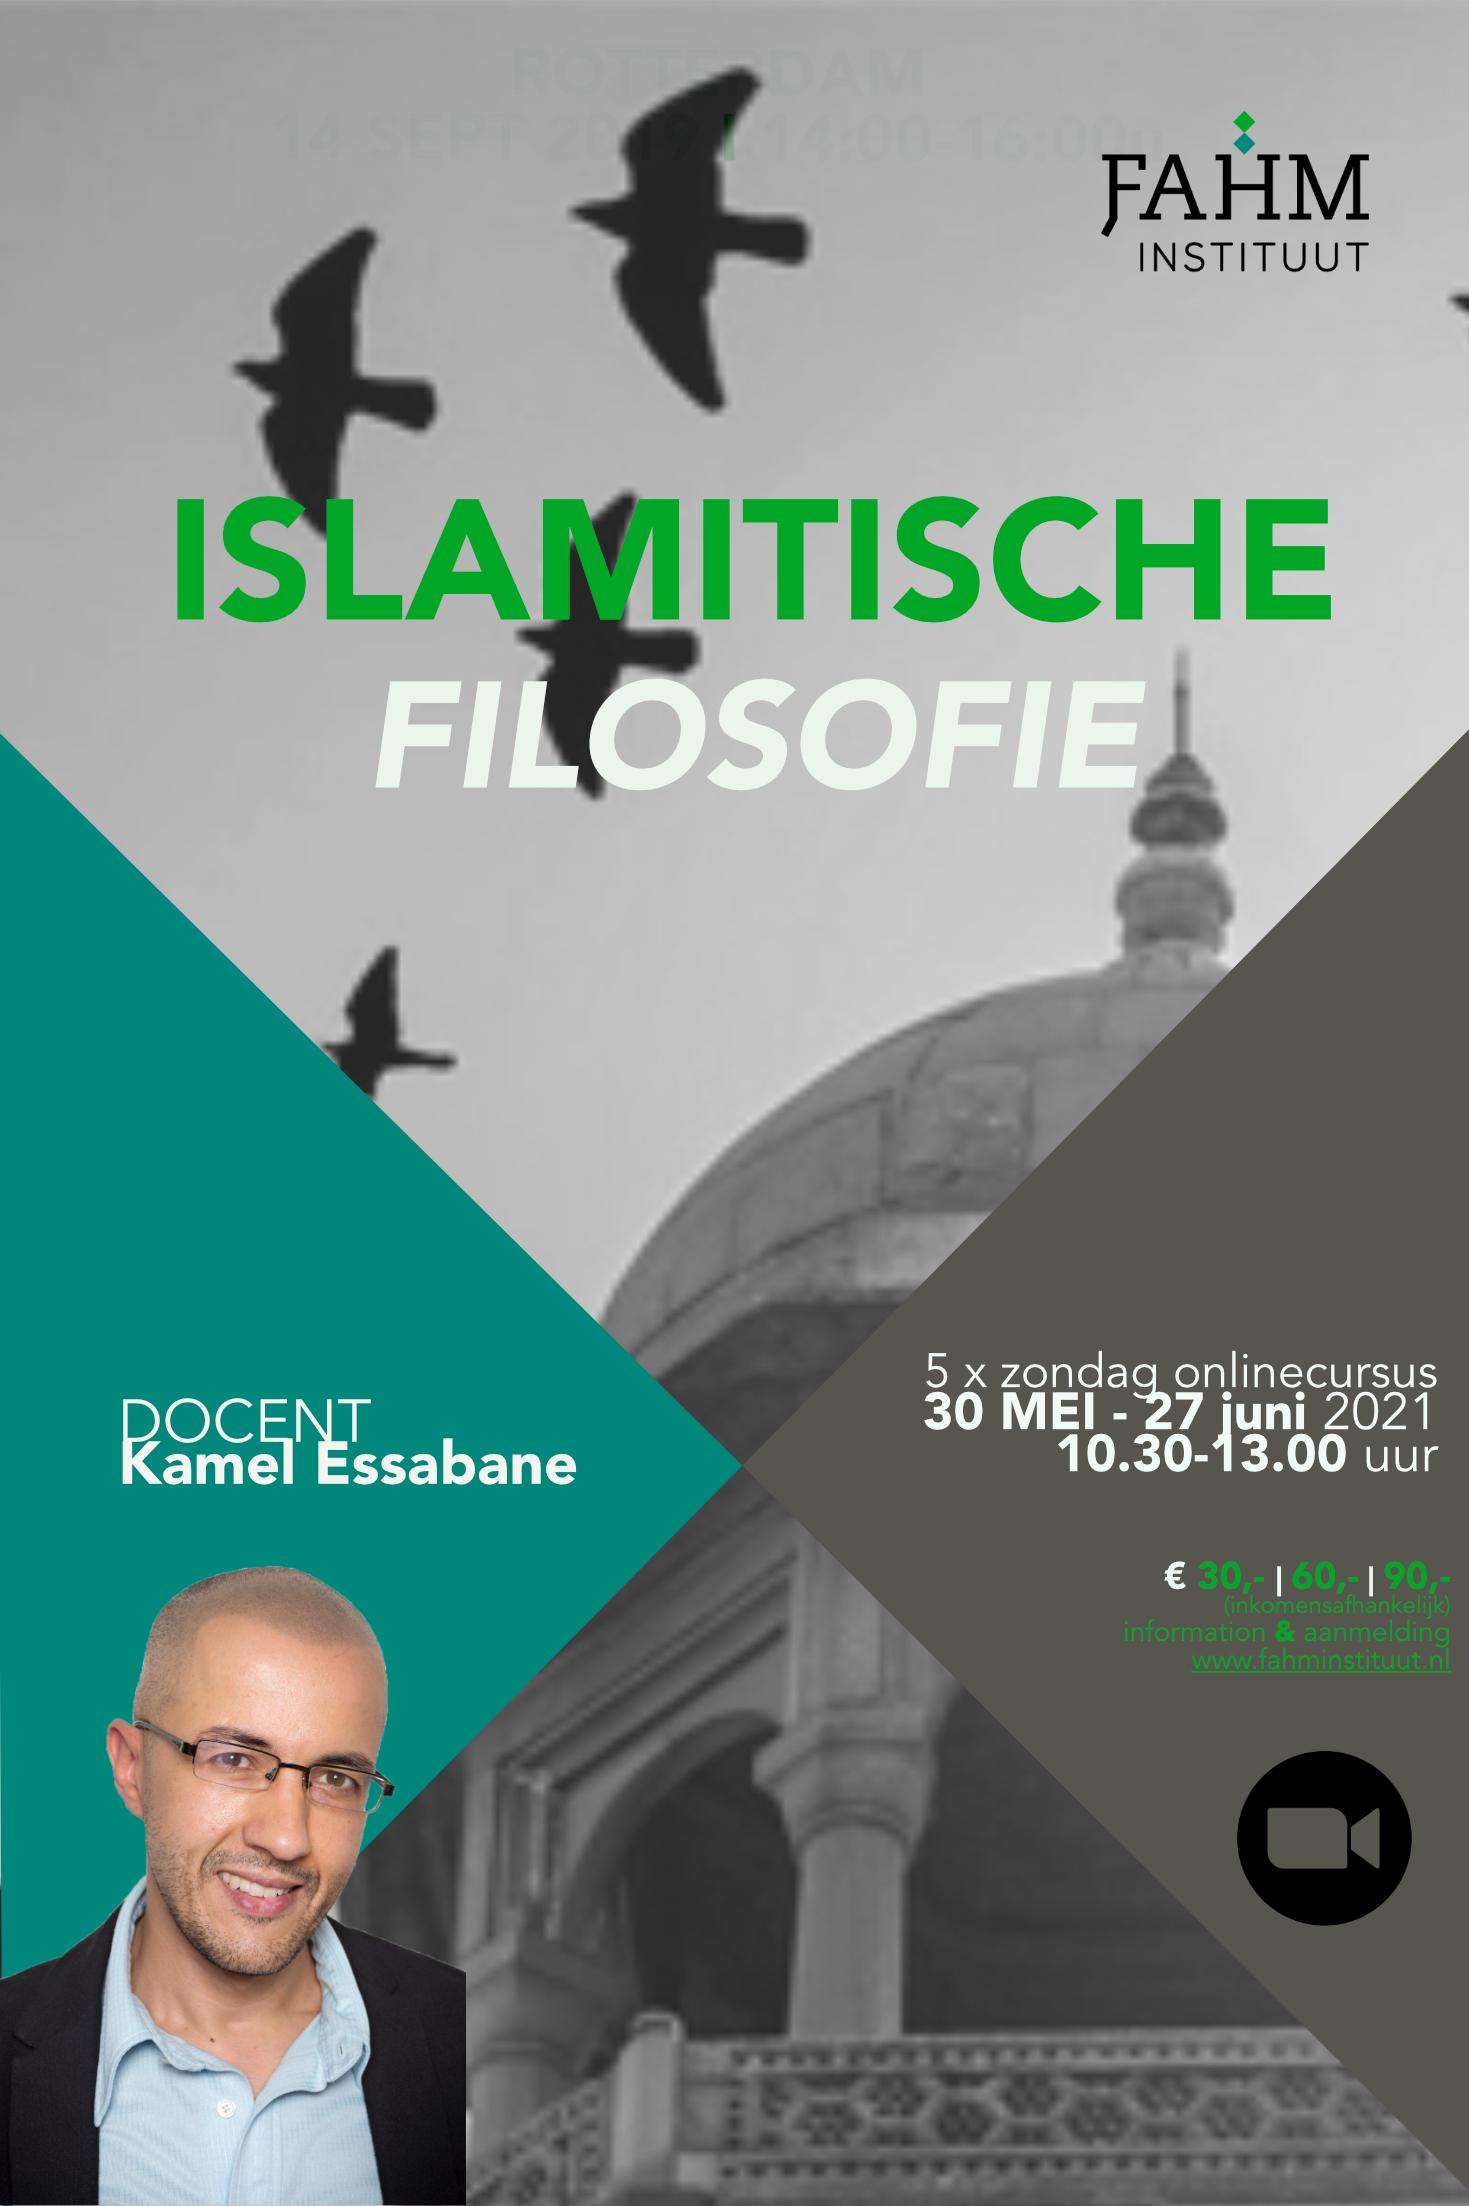 Fahm-ily flyer Islamitische filosofie